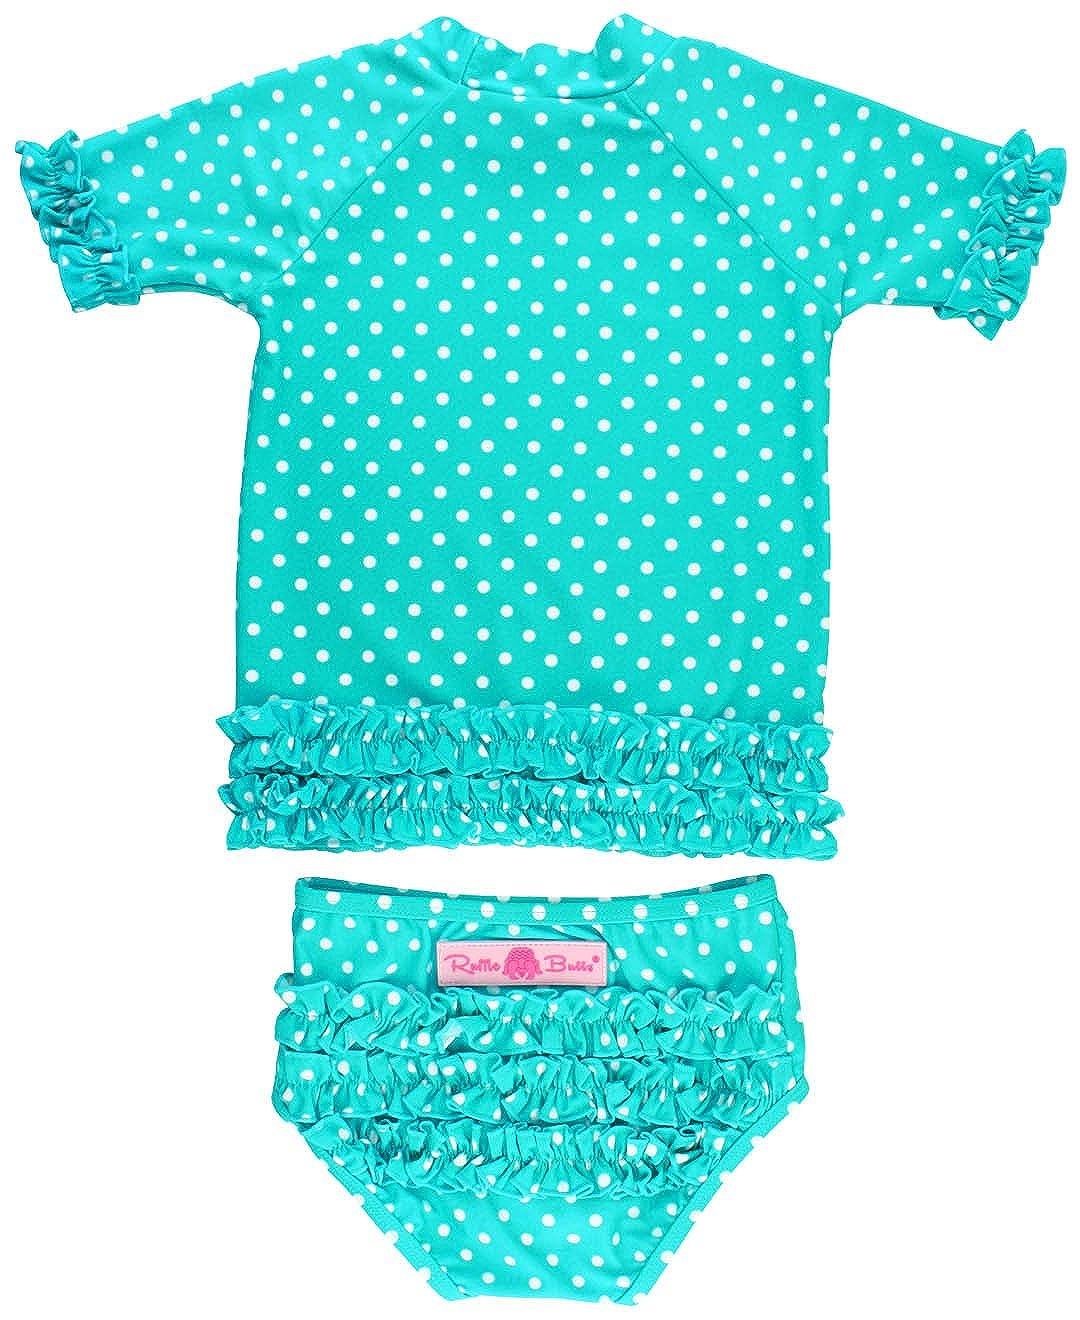 RuffleButts Little Girls Rash Guard 2-Piece Swimsuit Set - Polka Dot Bikini with UPF 50+ Sun Protection RGSYYXX-SSPK-SC-TDLR